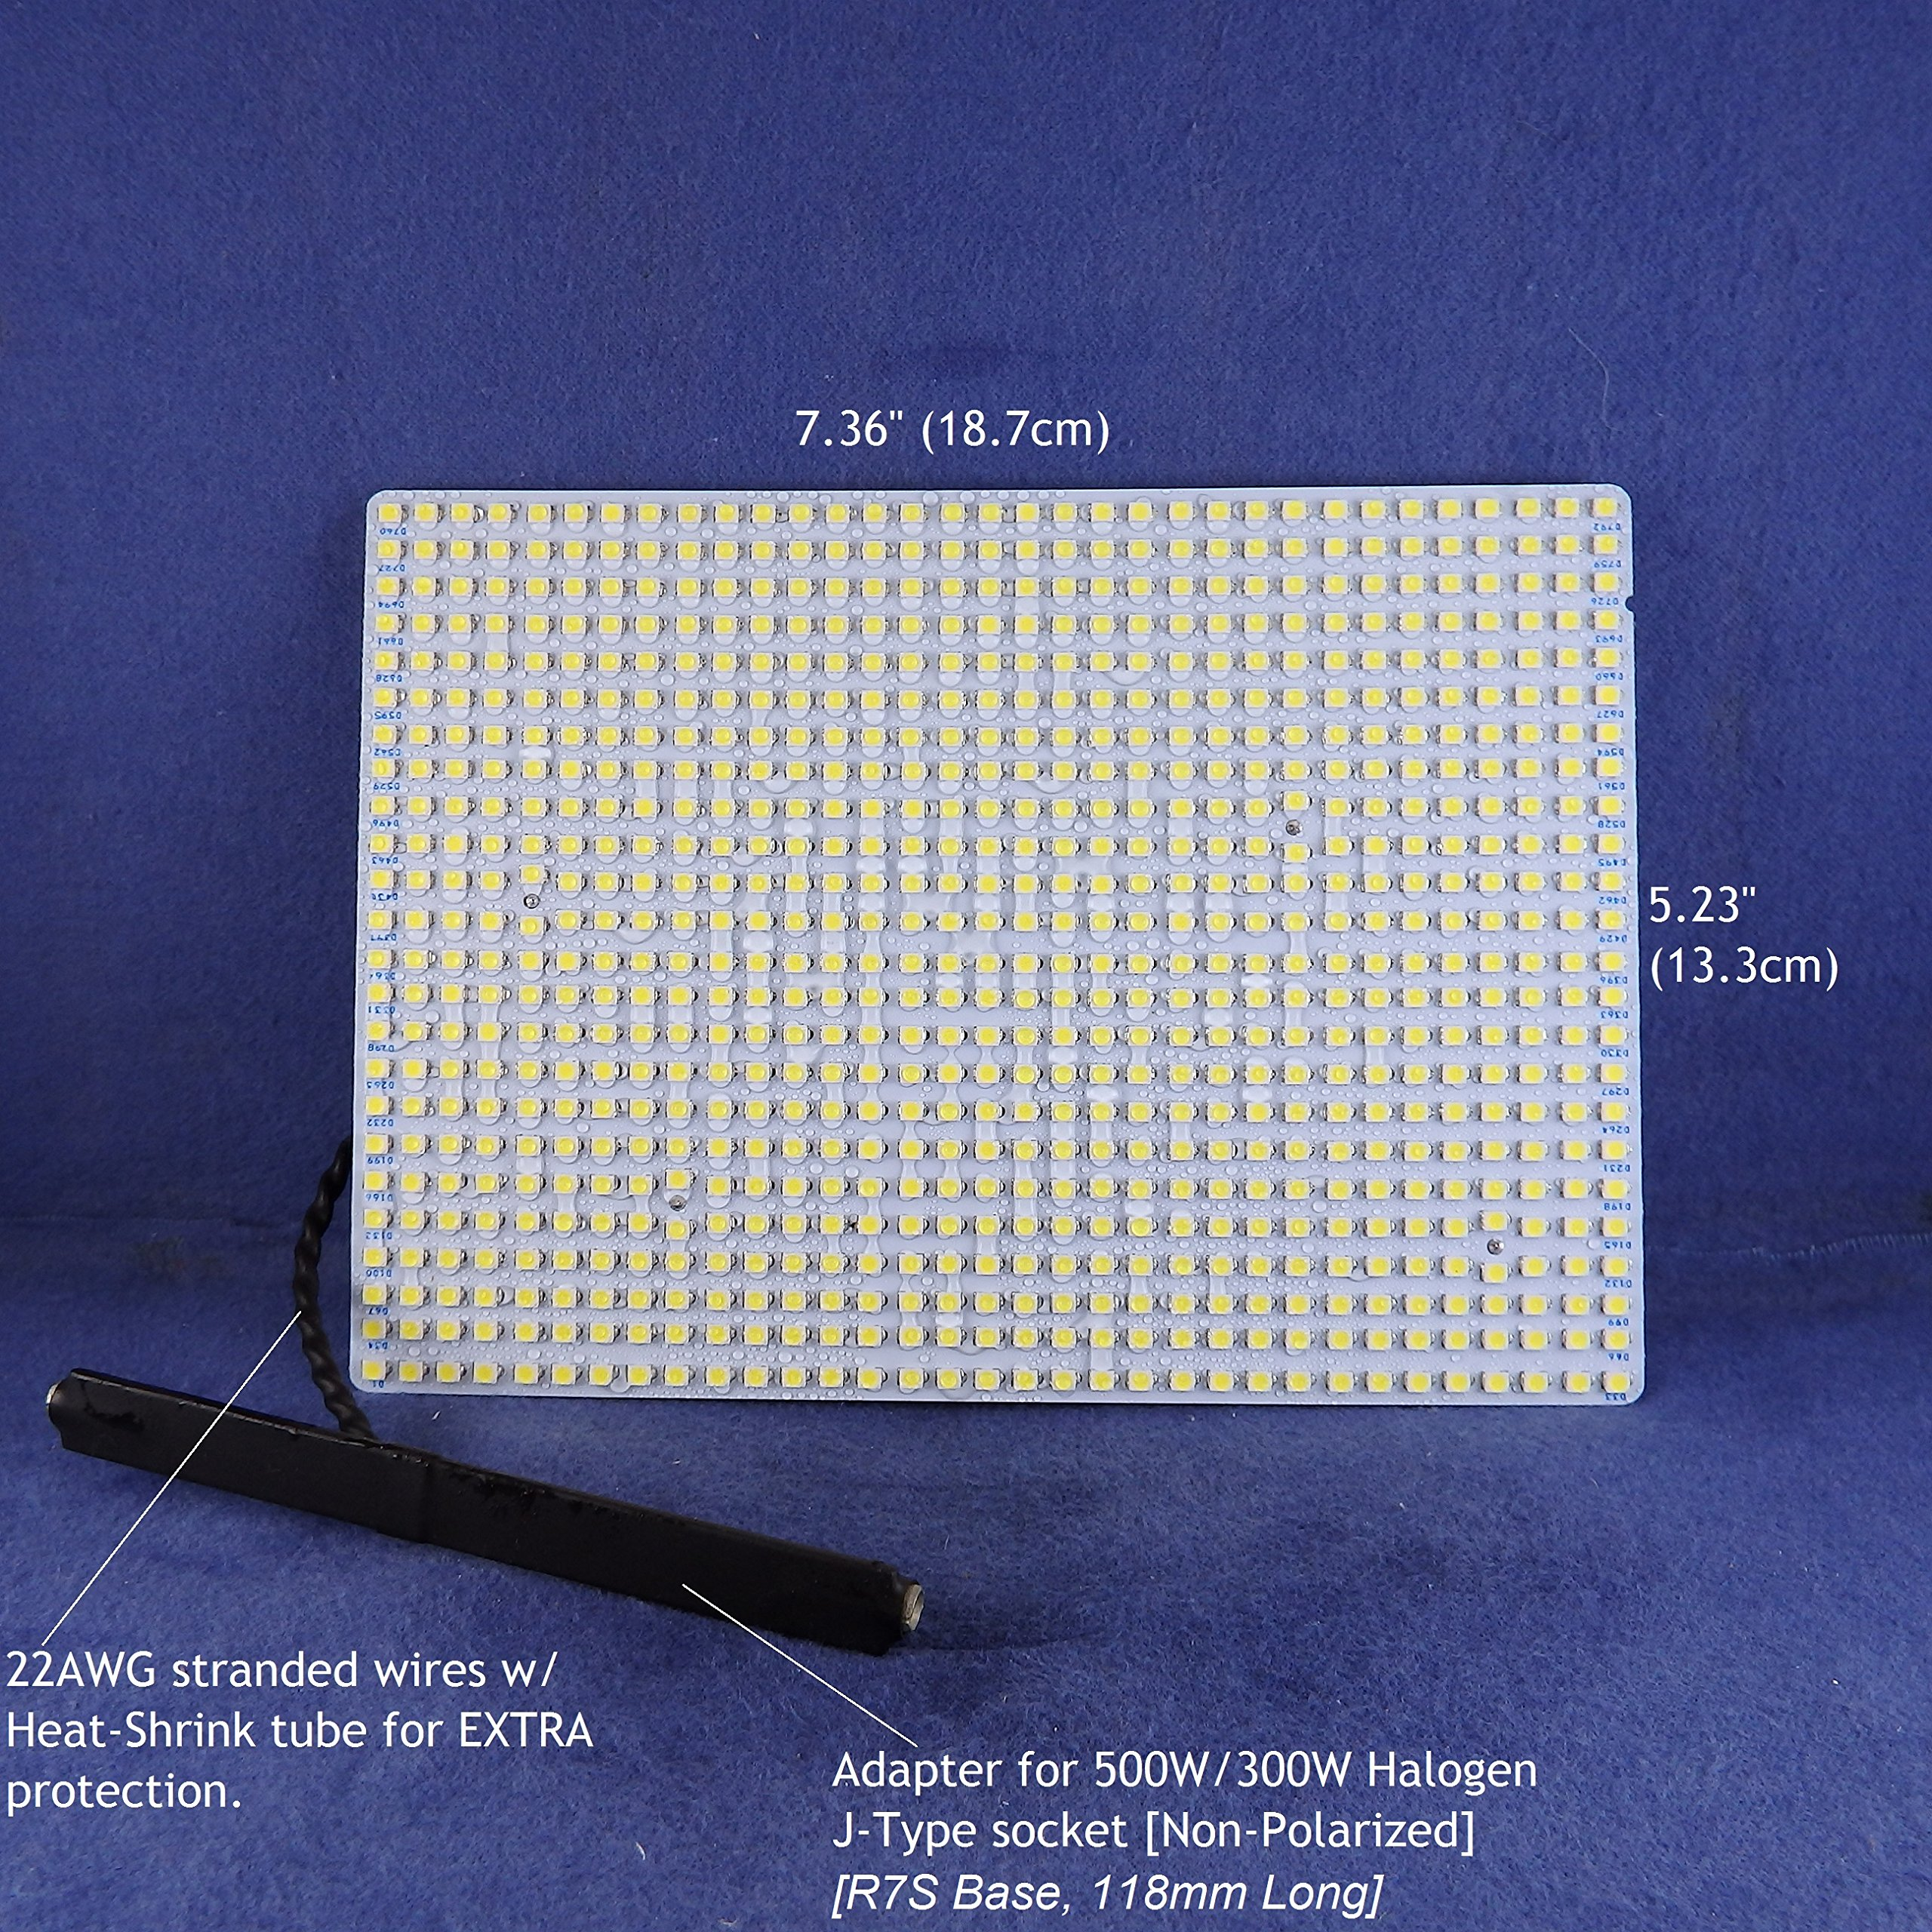 LED Panel for RETROFIT 300W/500W FLOOD LIGHT Halogen light fixtures -- 7000Lumens 33Watts -- WARM WHITE (4000K). P/N: SPTL792LRC-4K